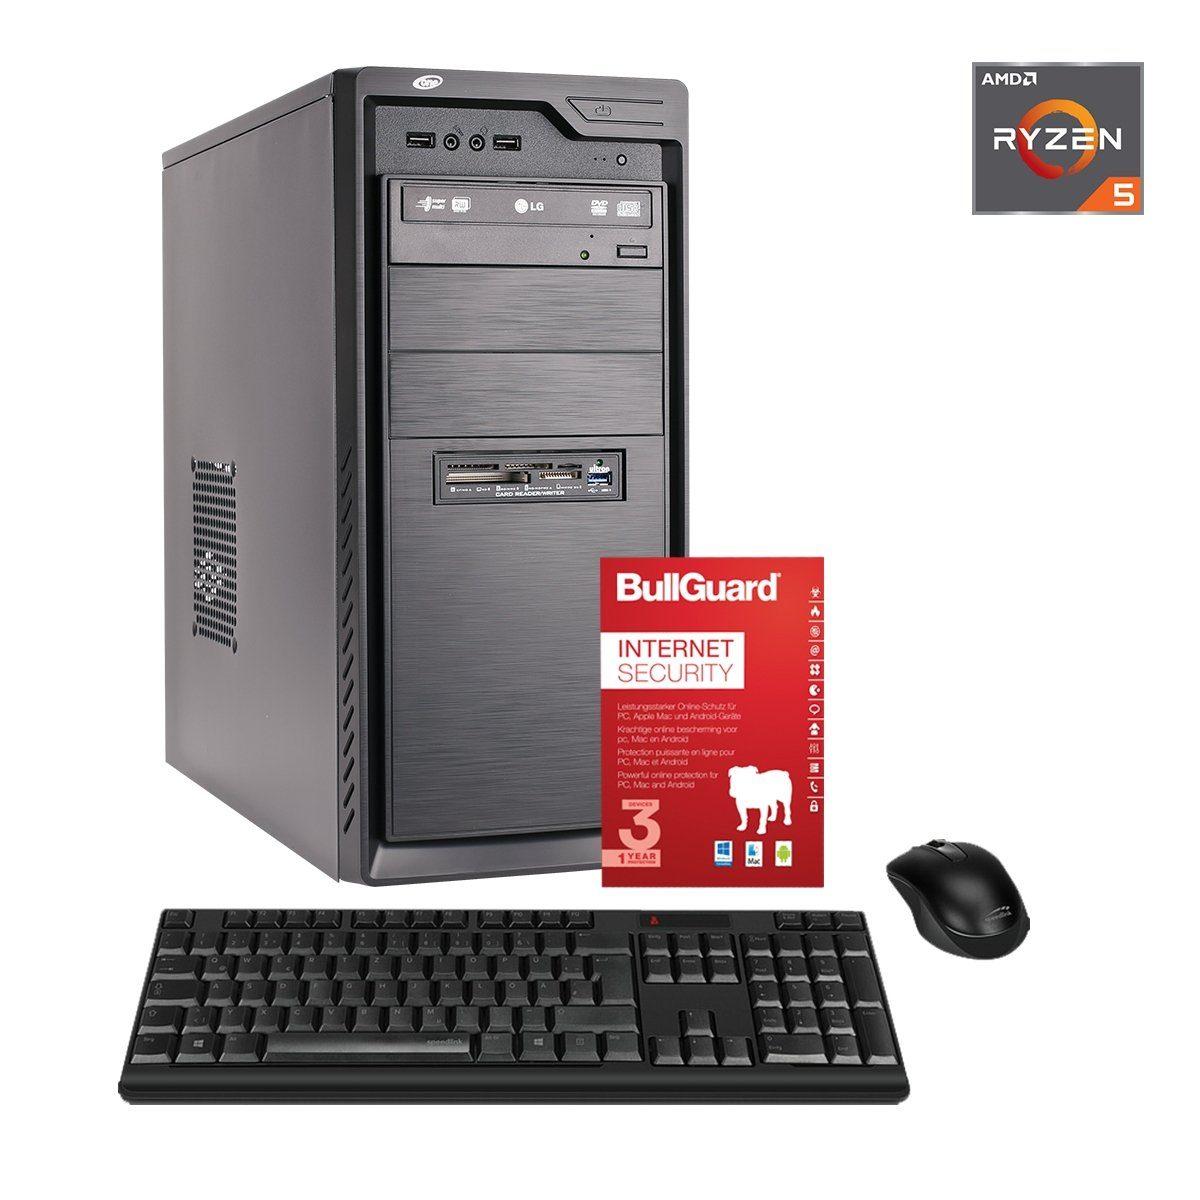 ONE PC, Ryzen 5 2400G, Radeon RX Vega 11 Graphics, 8GB DDR4 SDRAM »Office PC 44693«